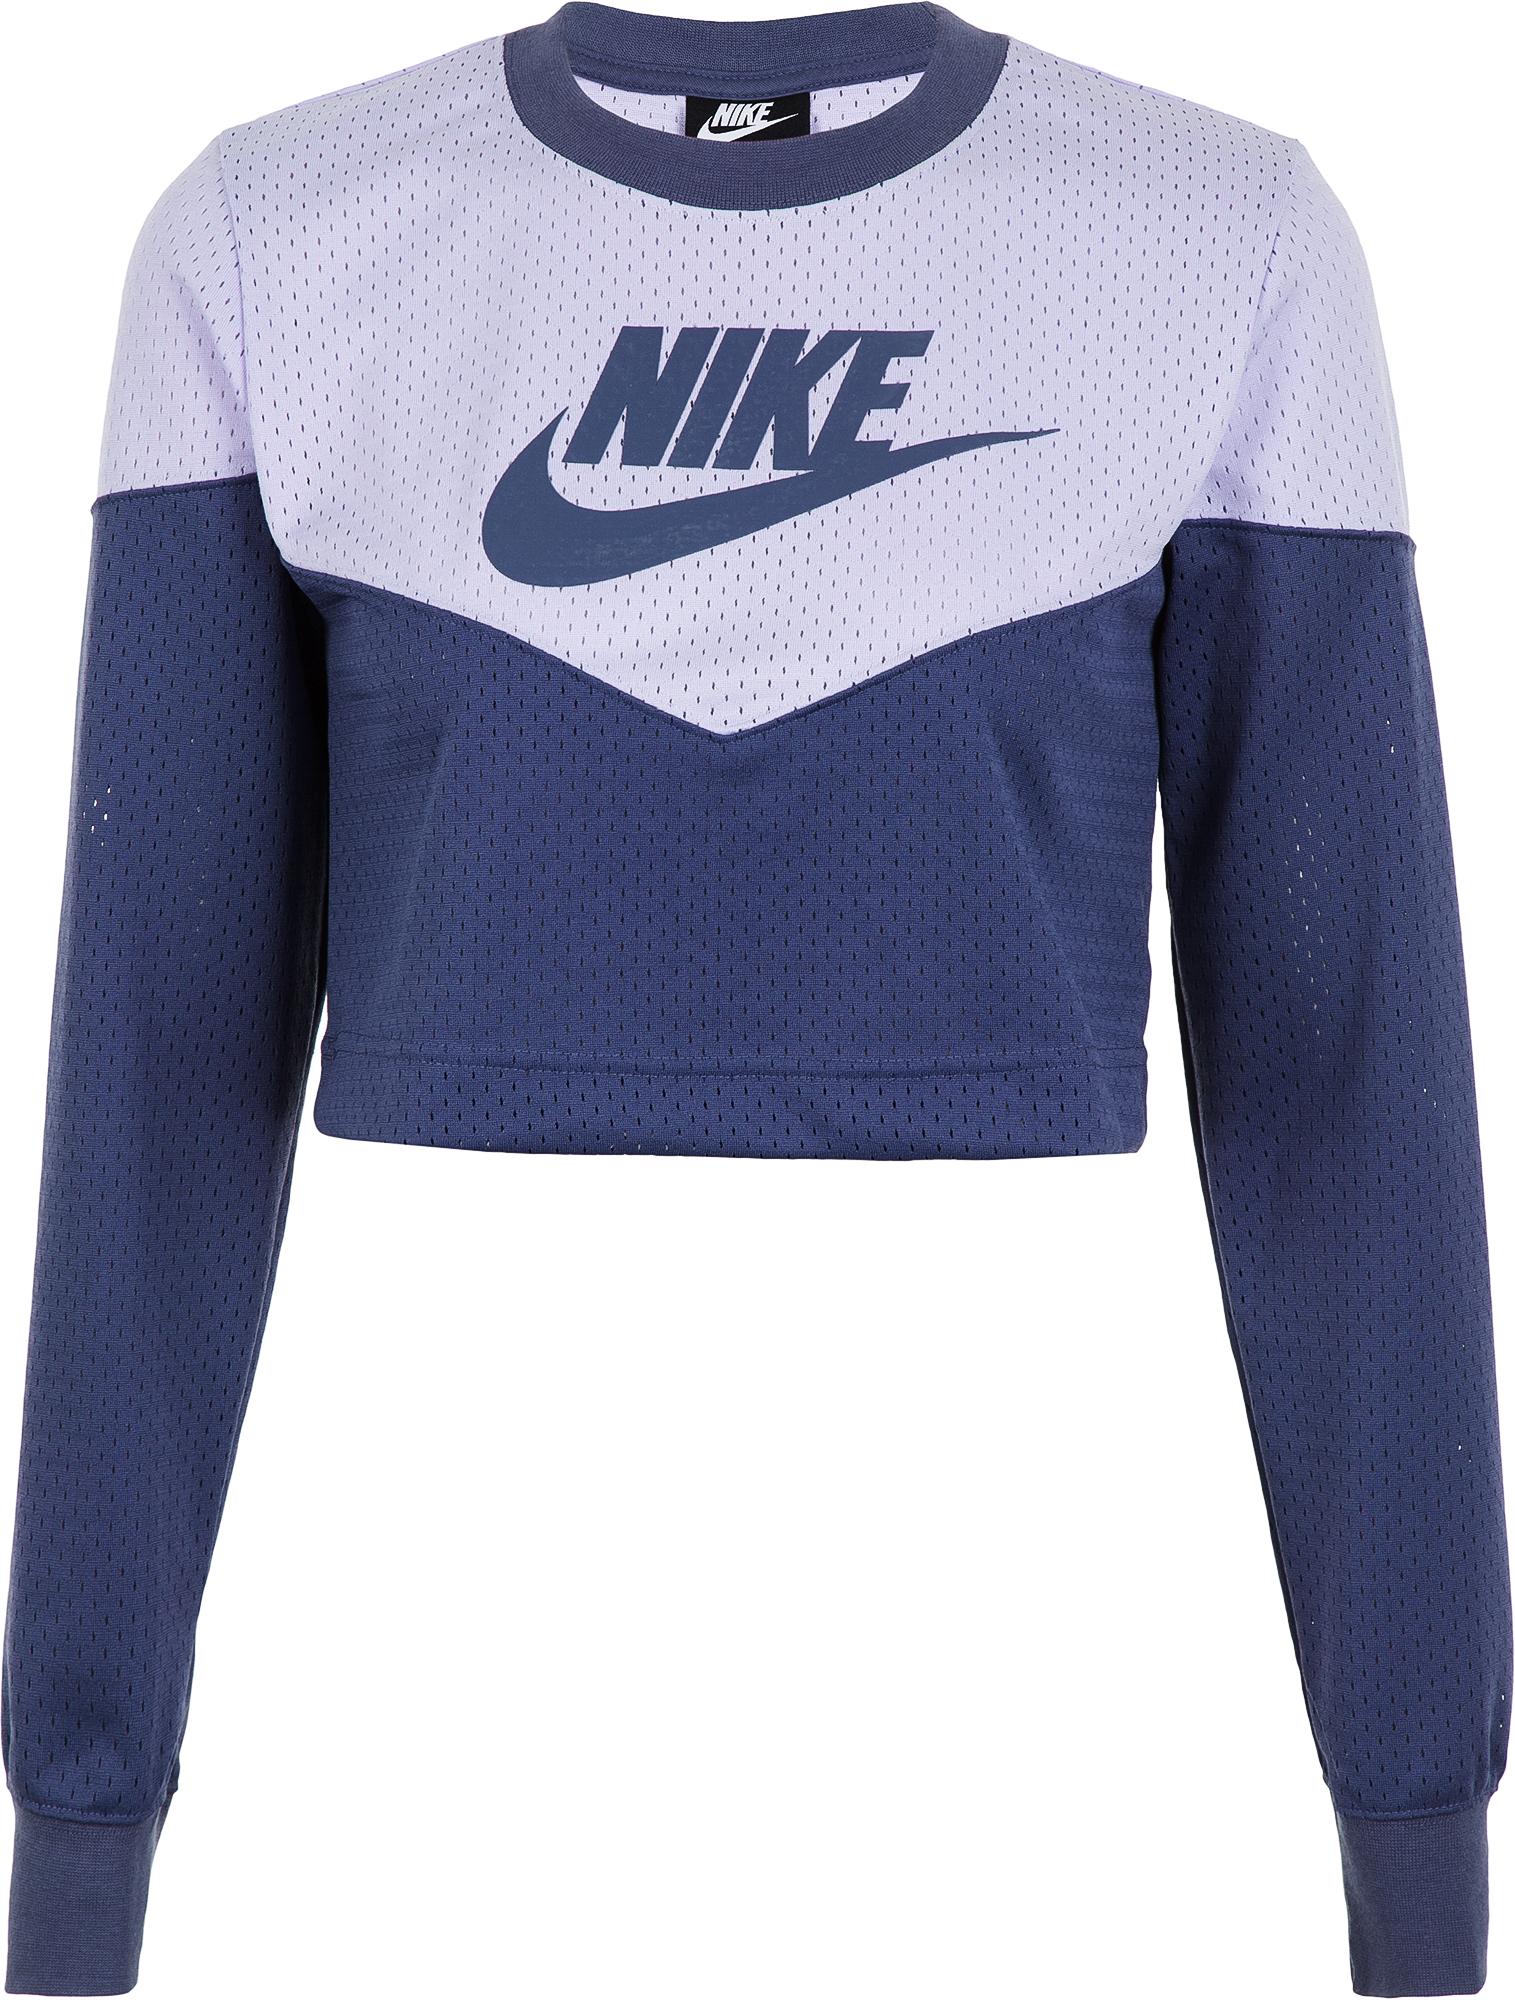 Nike Лонгслив женский Nike Sportswear Heritage, размер 46-48 леггинсы женские nike sportswear leggings цвет серый 883657 036 размер m 46 48